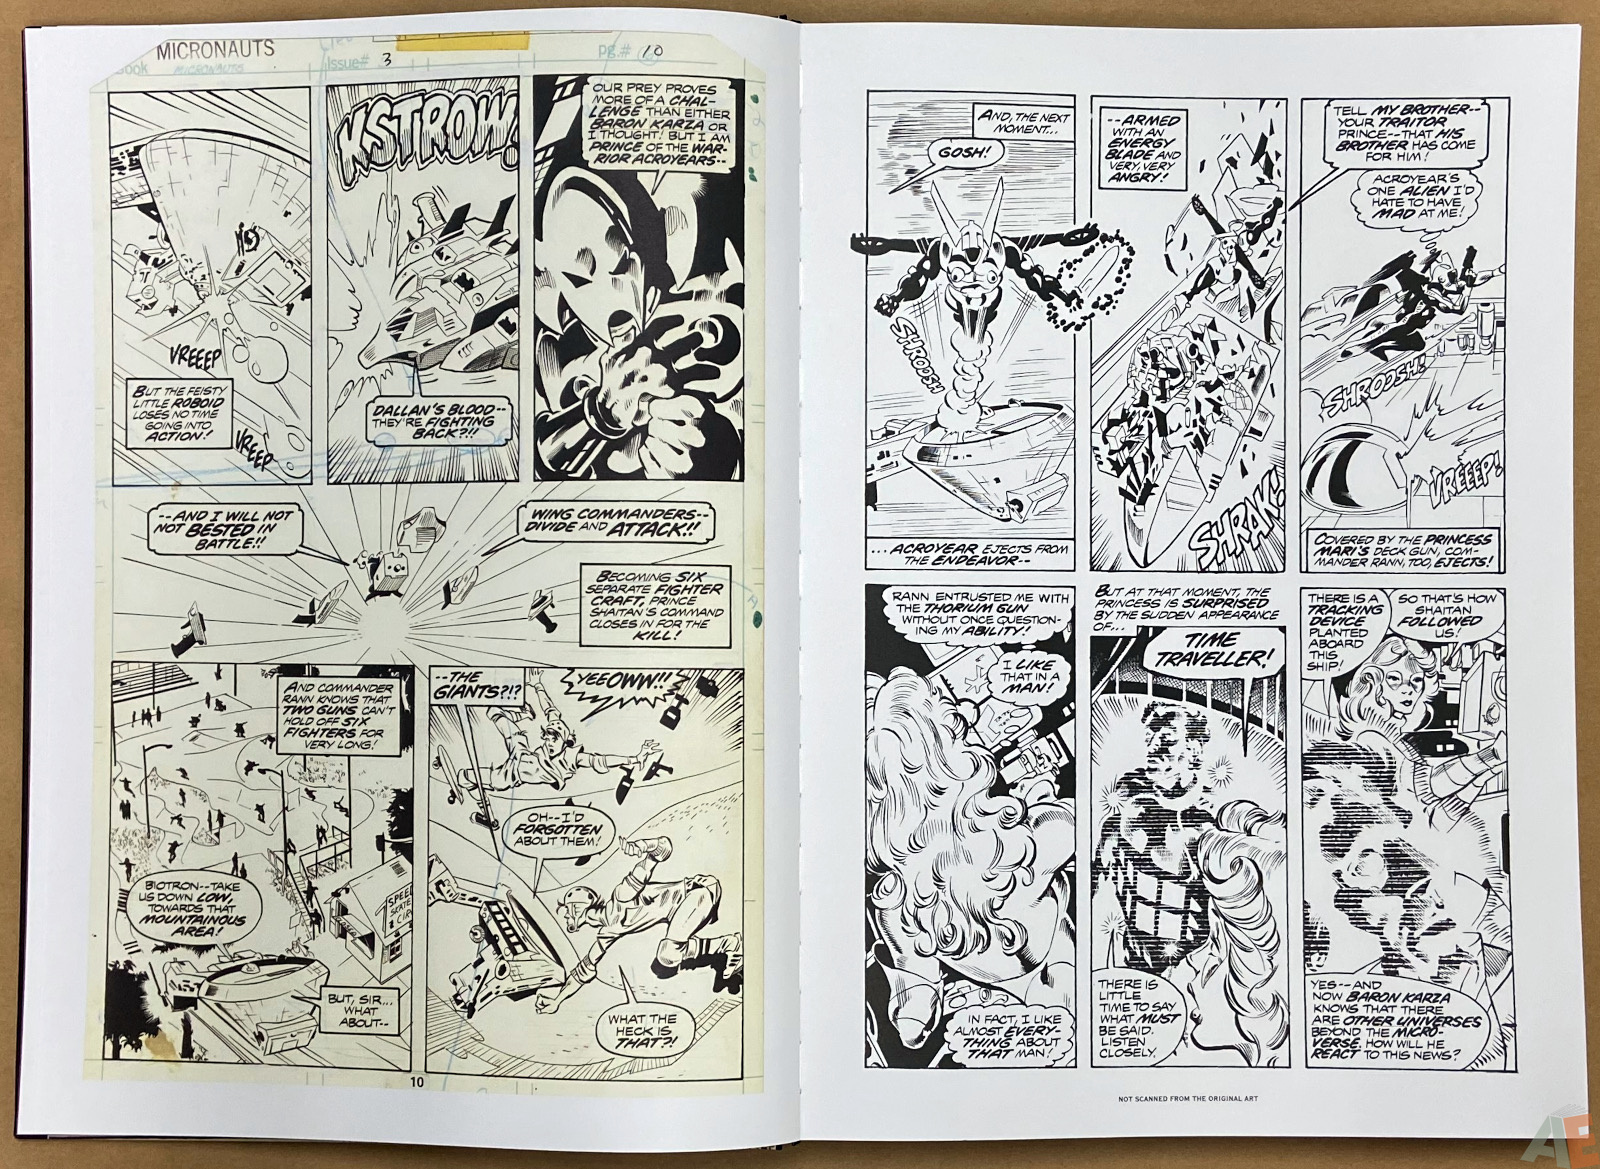 Michael Goldens Micronauts Artists Edition interior 4